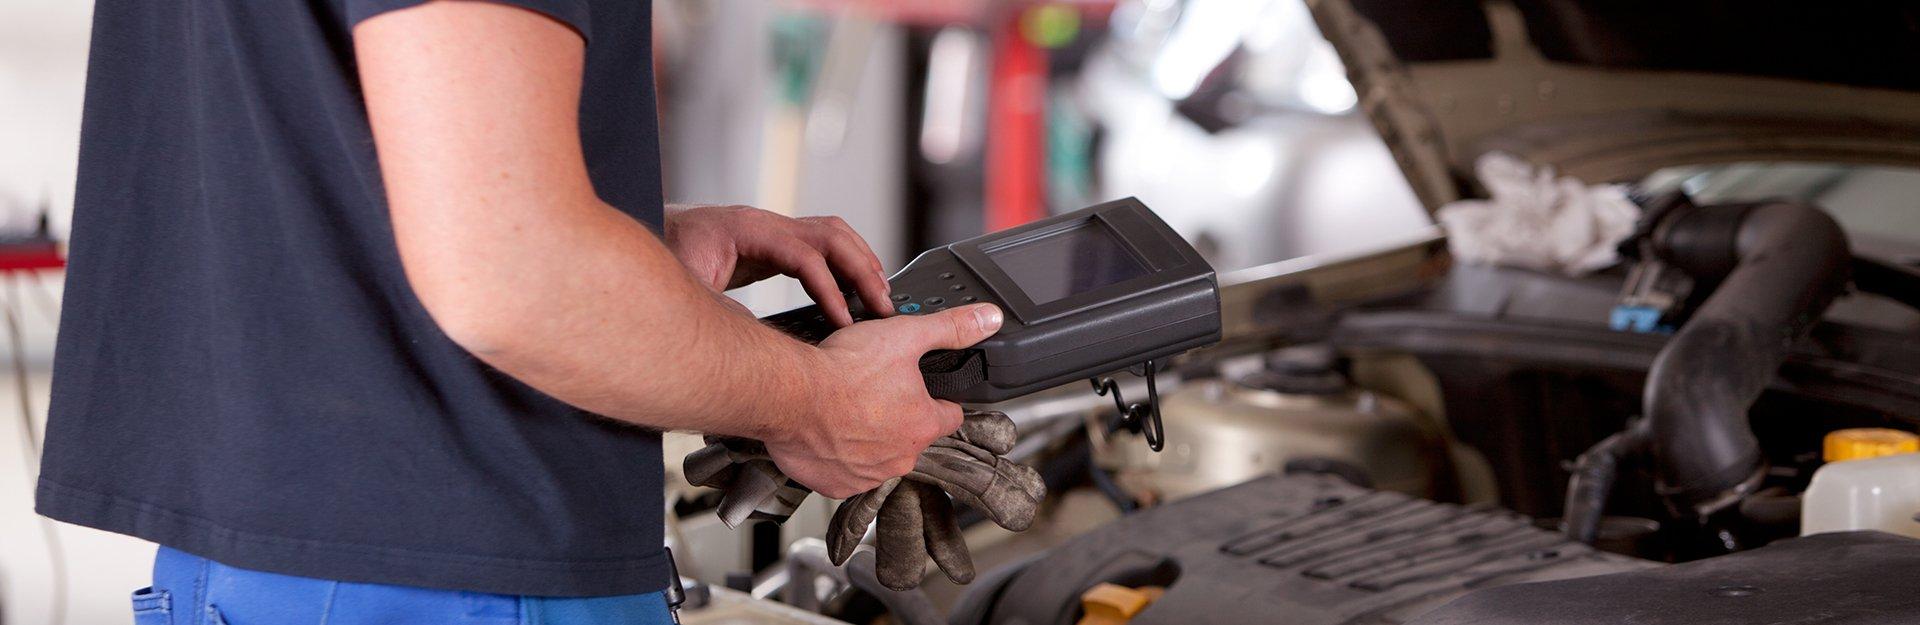 A vehicle diagnostic testing kit